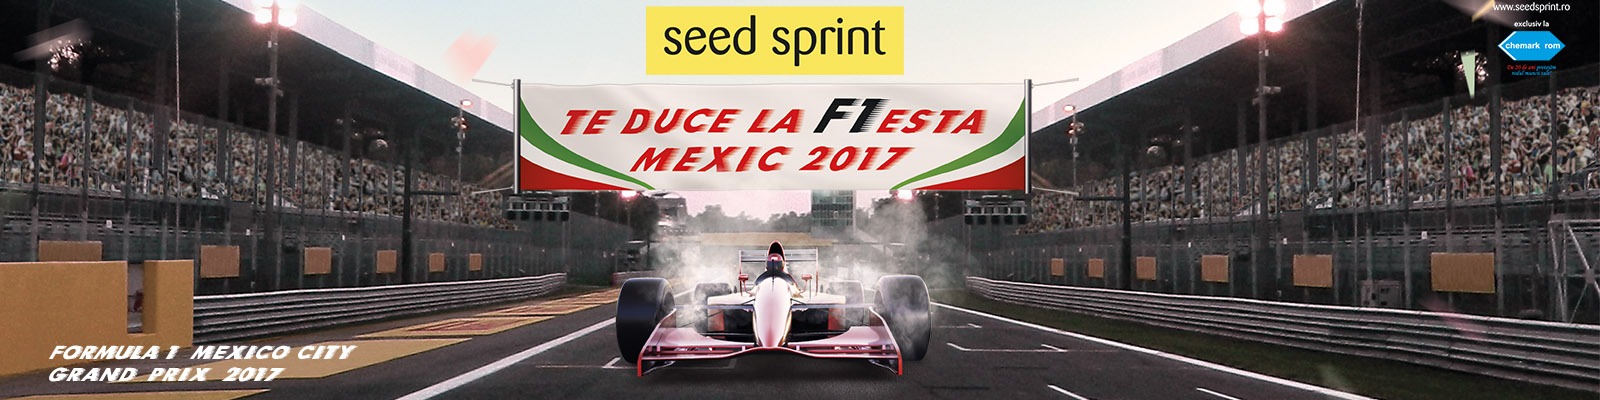 vizual seed sprin te duce la mexic